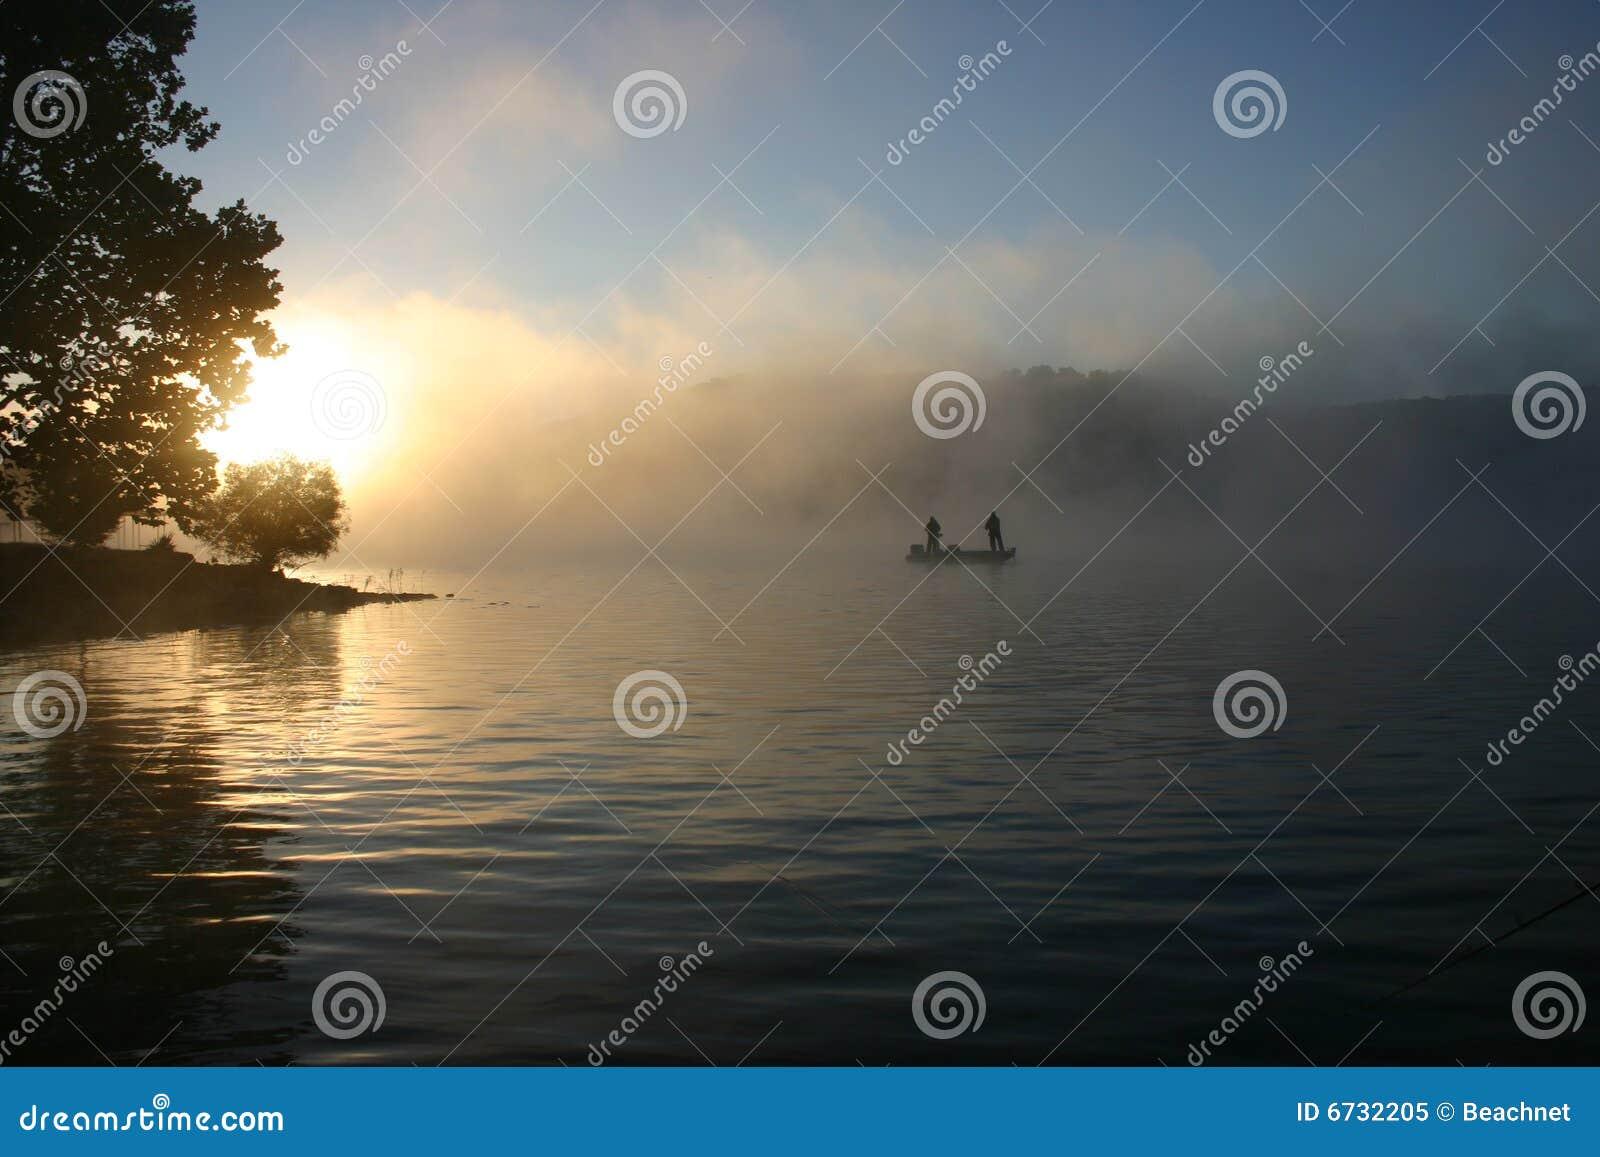 Lake Of The Ozarks Web Design